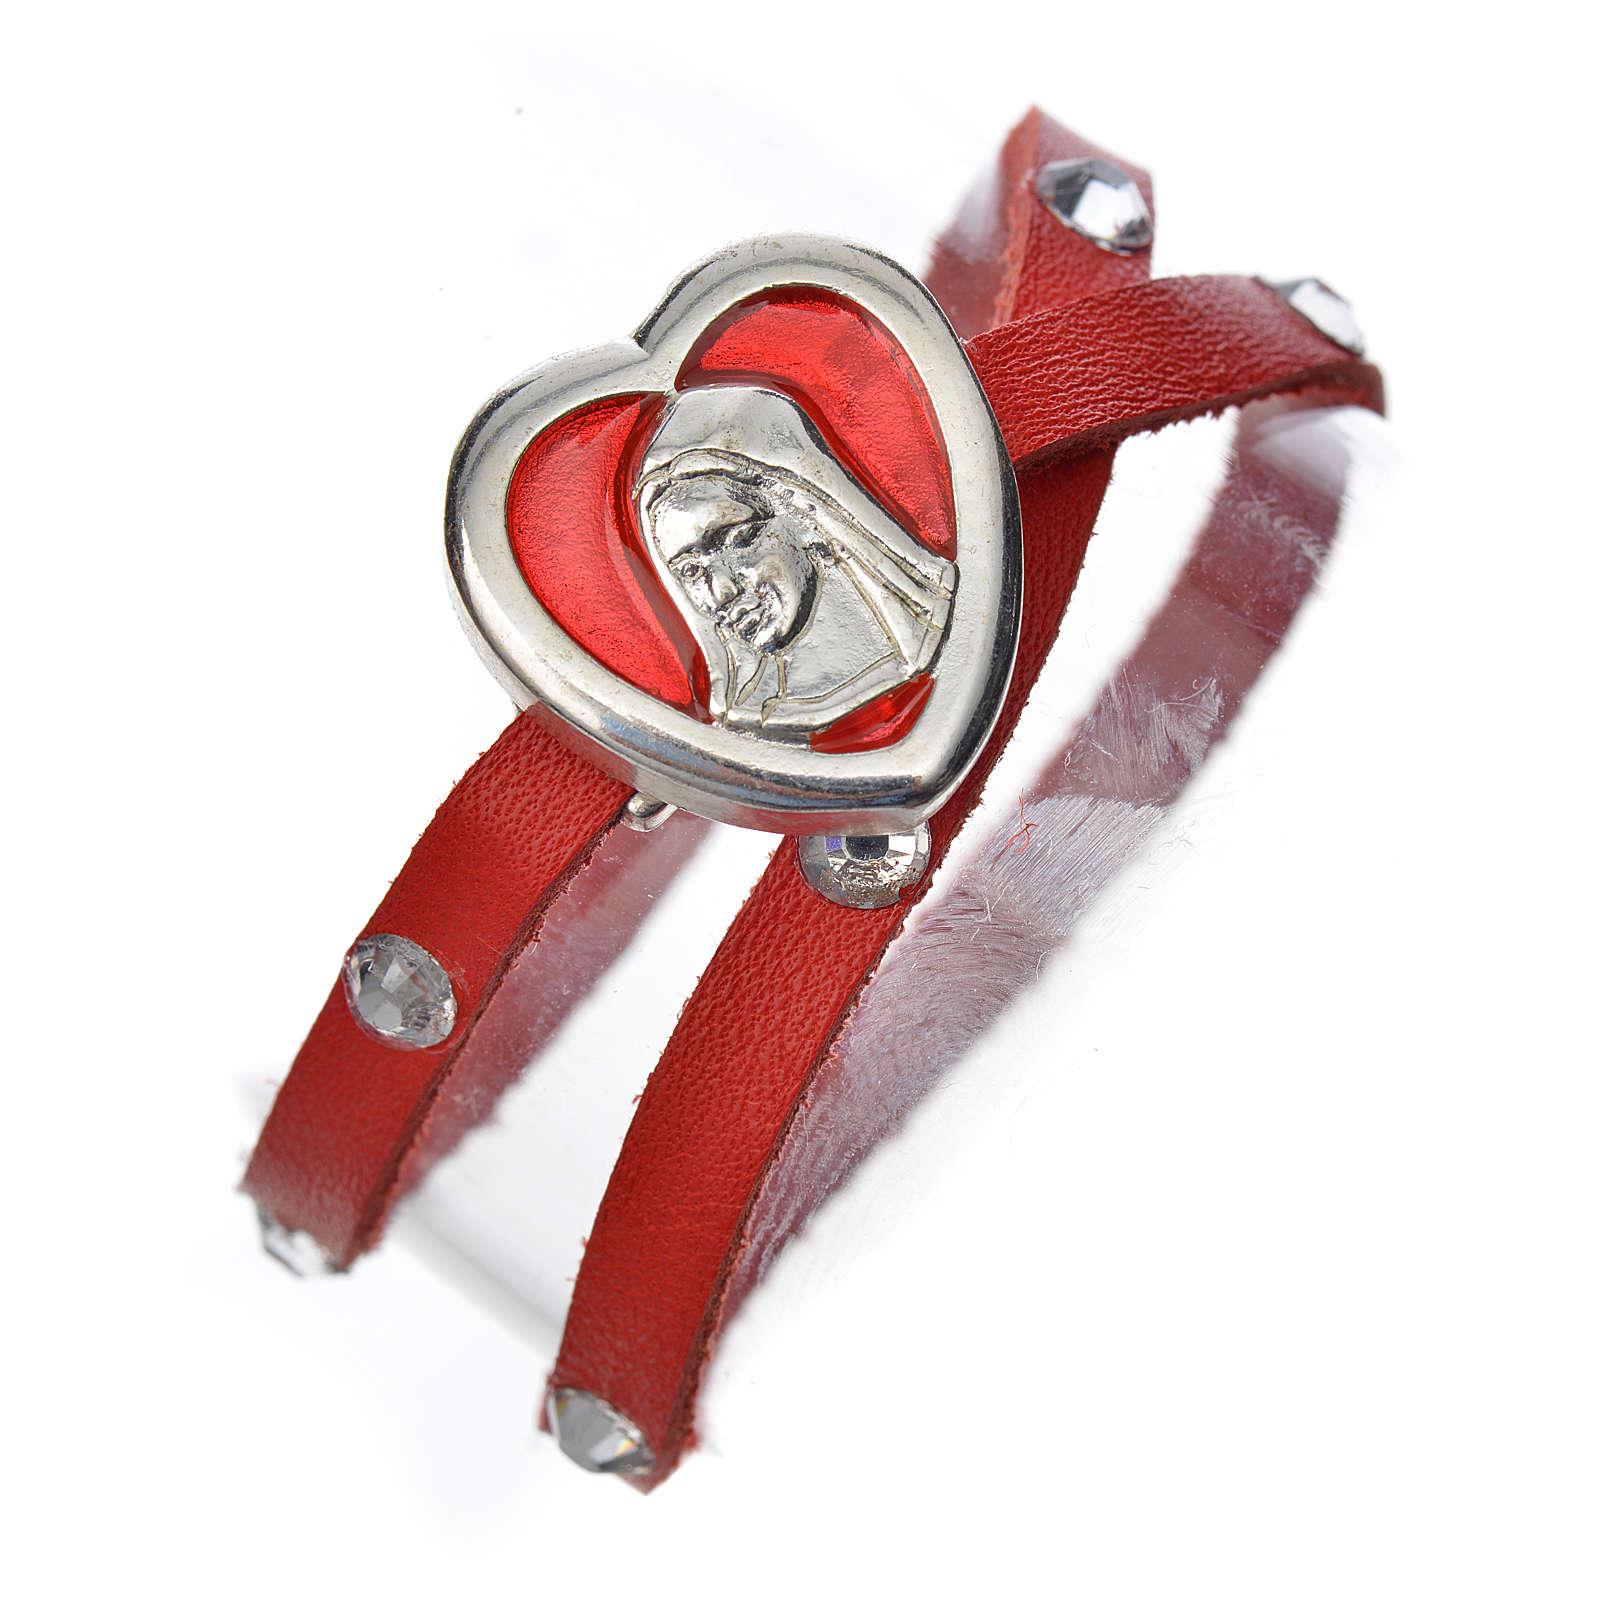 Bracelet with Swarovski, red leather, Virgin Mary pendant 4